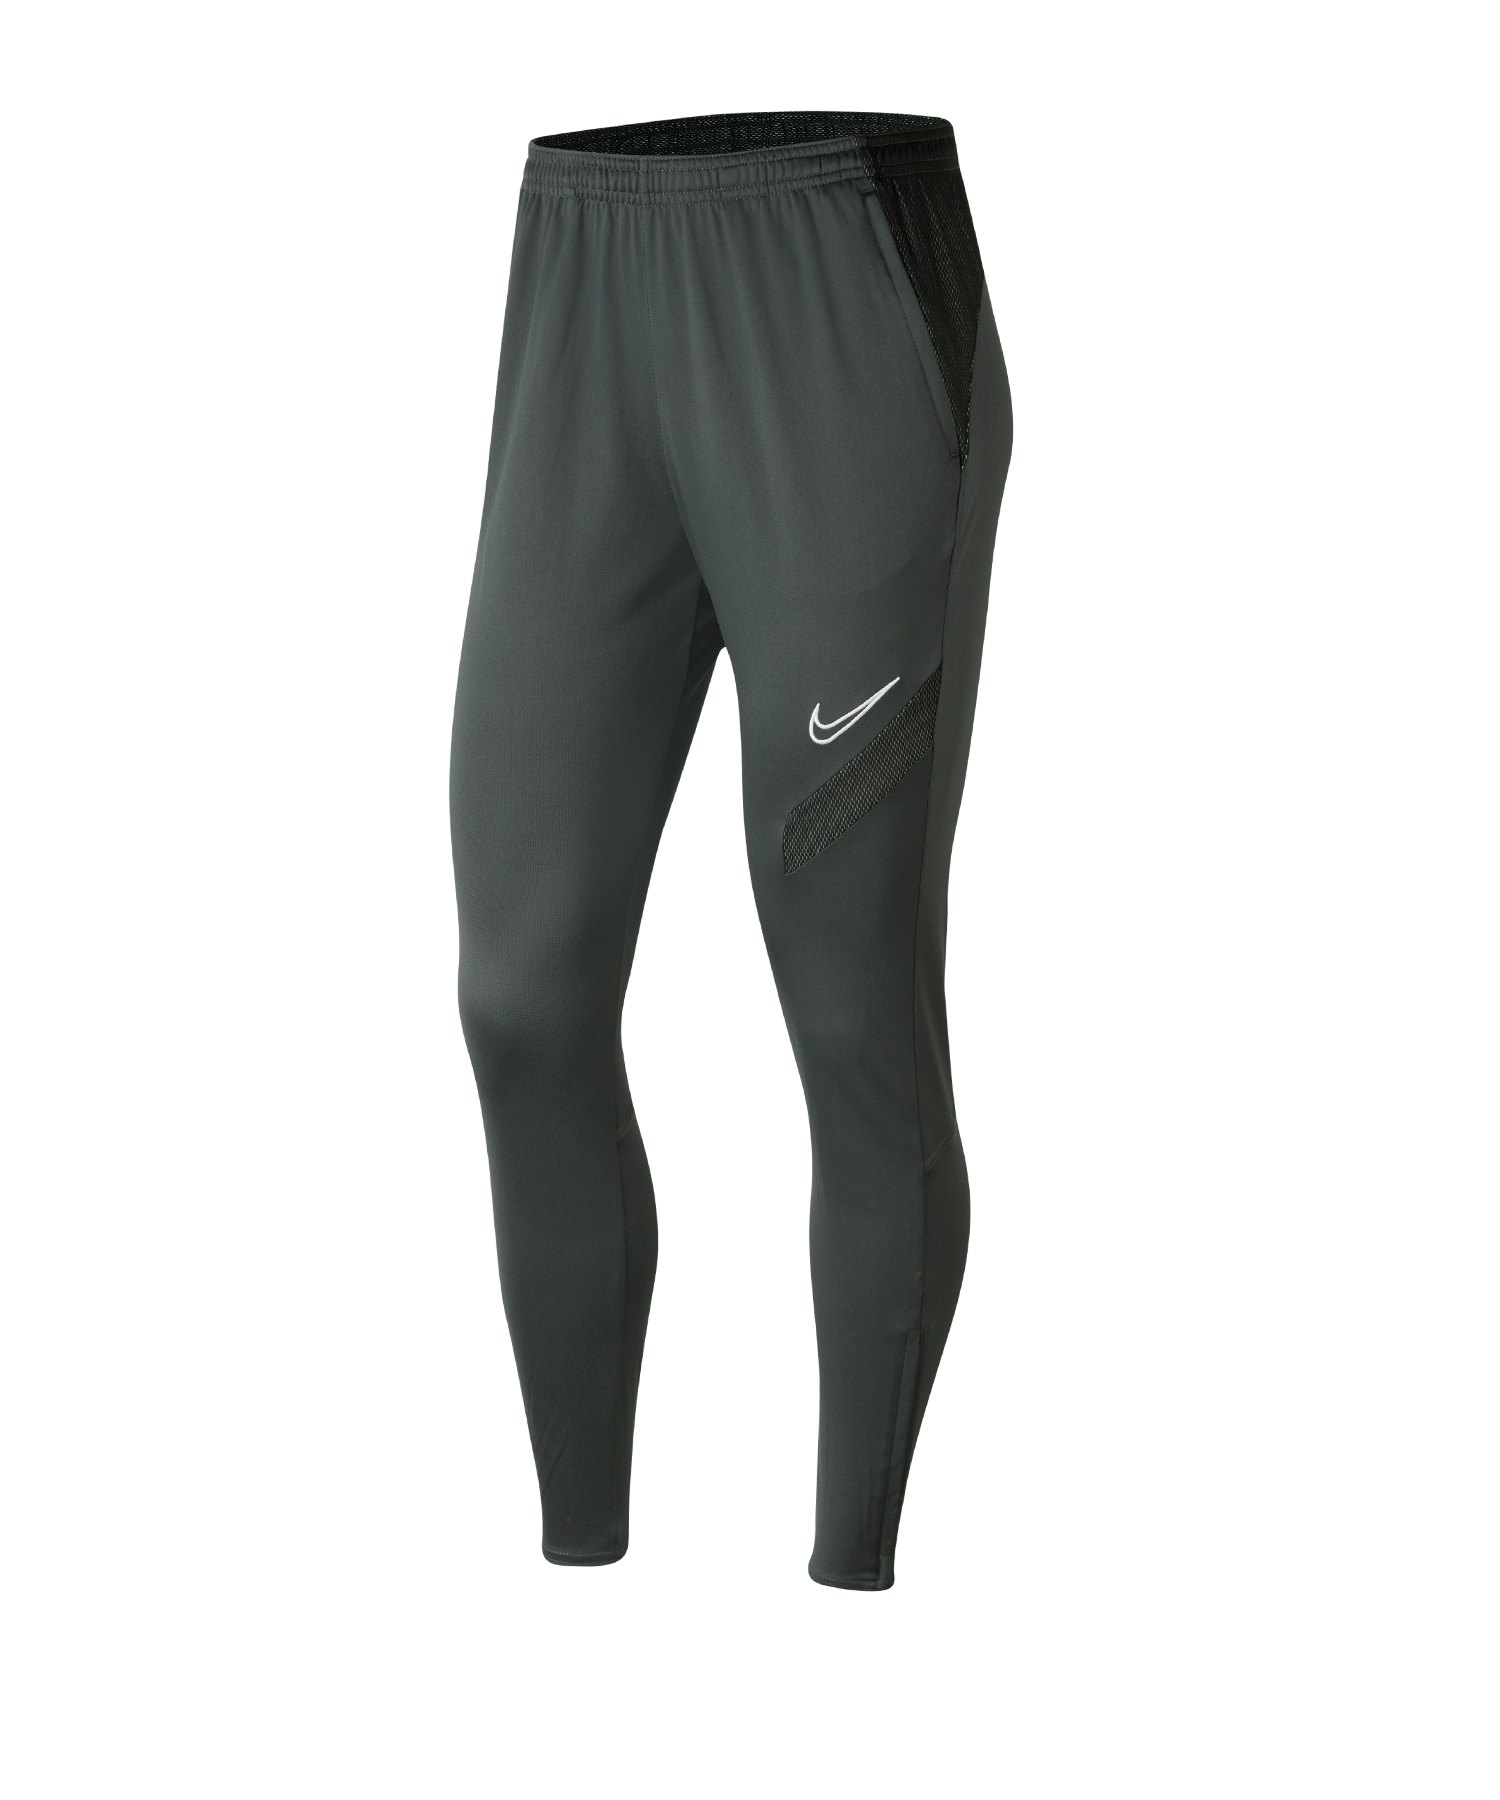 Nike Academy Pro Pants Damen Grau Schwarz F010 - schwarz